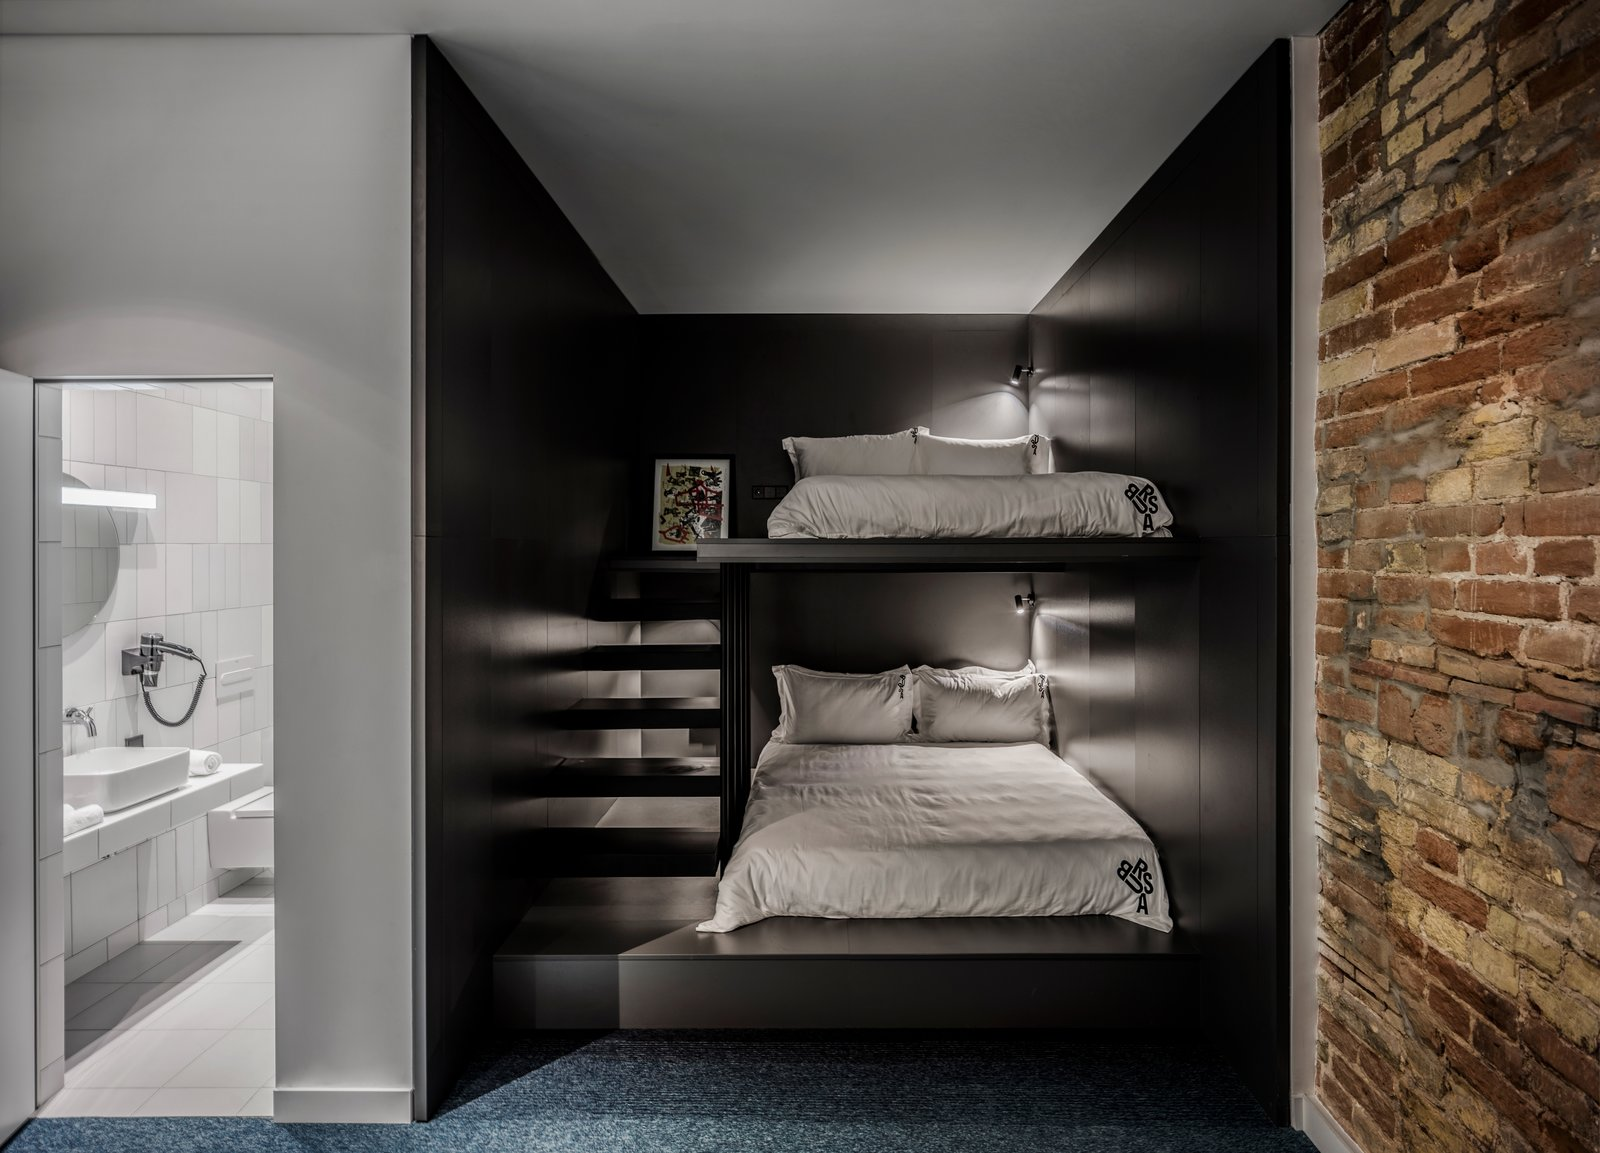 Bursa hotel guest suite with bunk beds